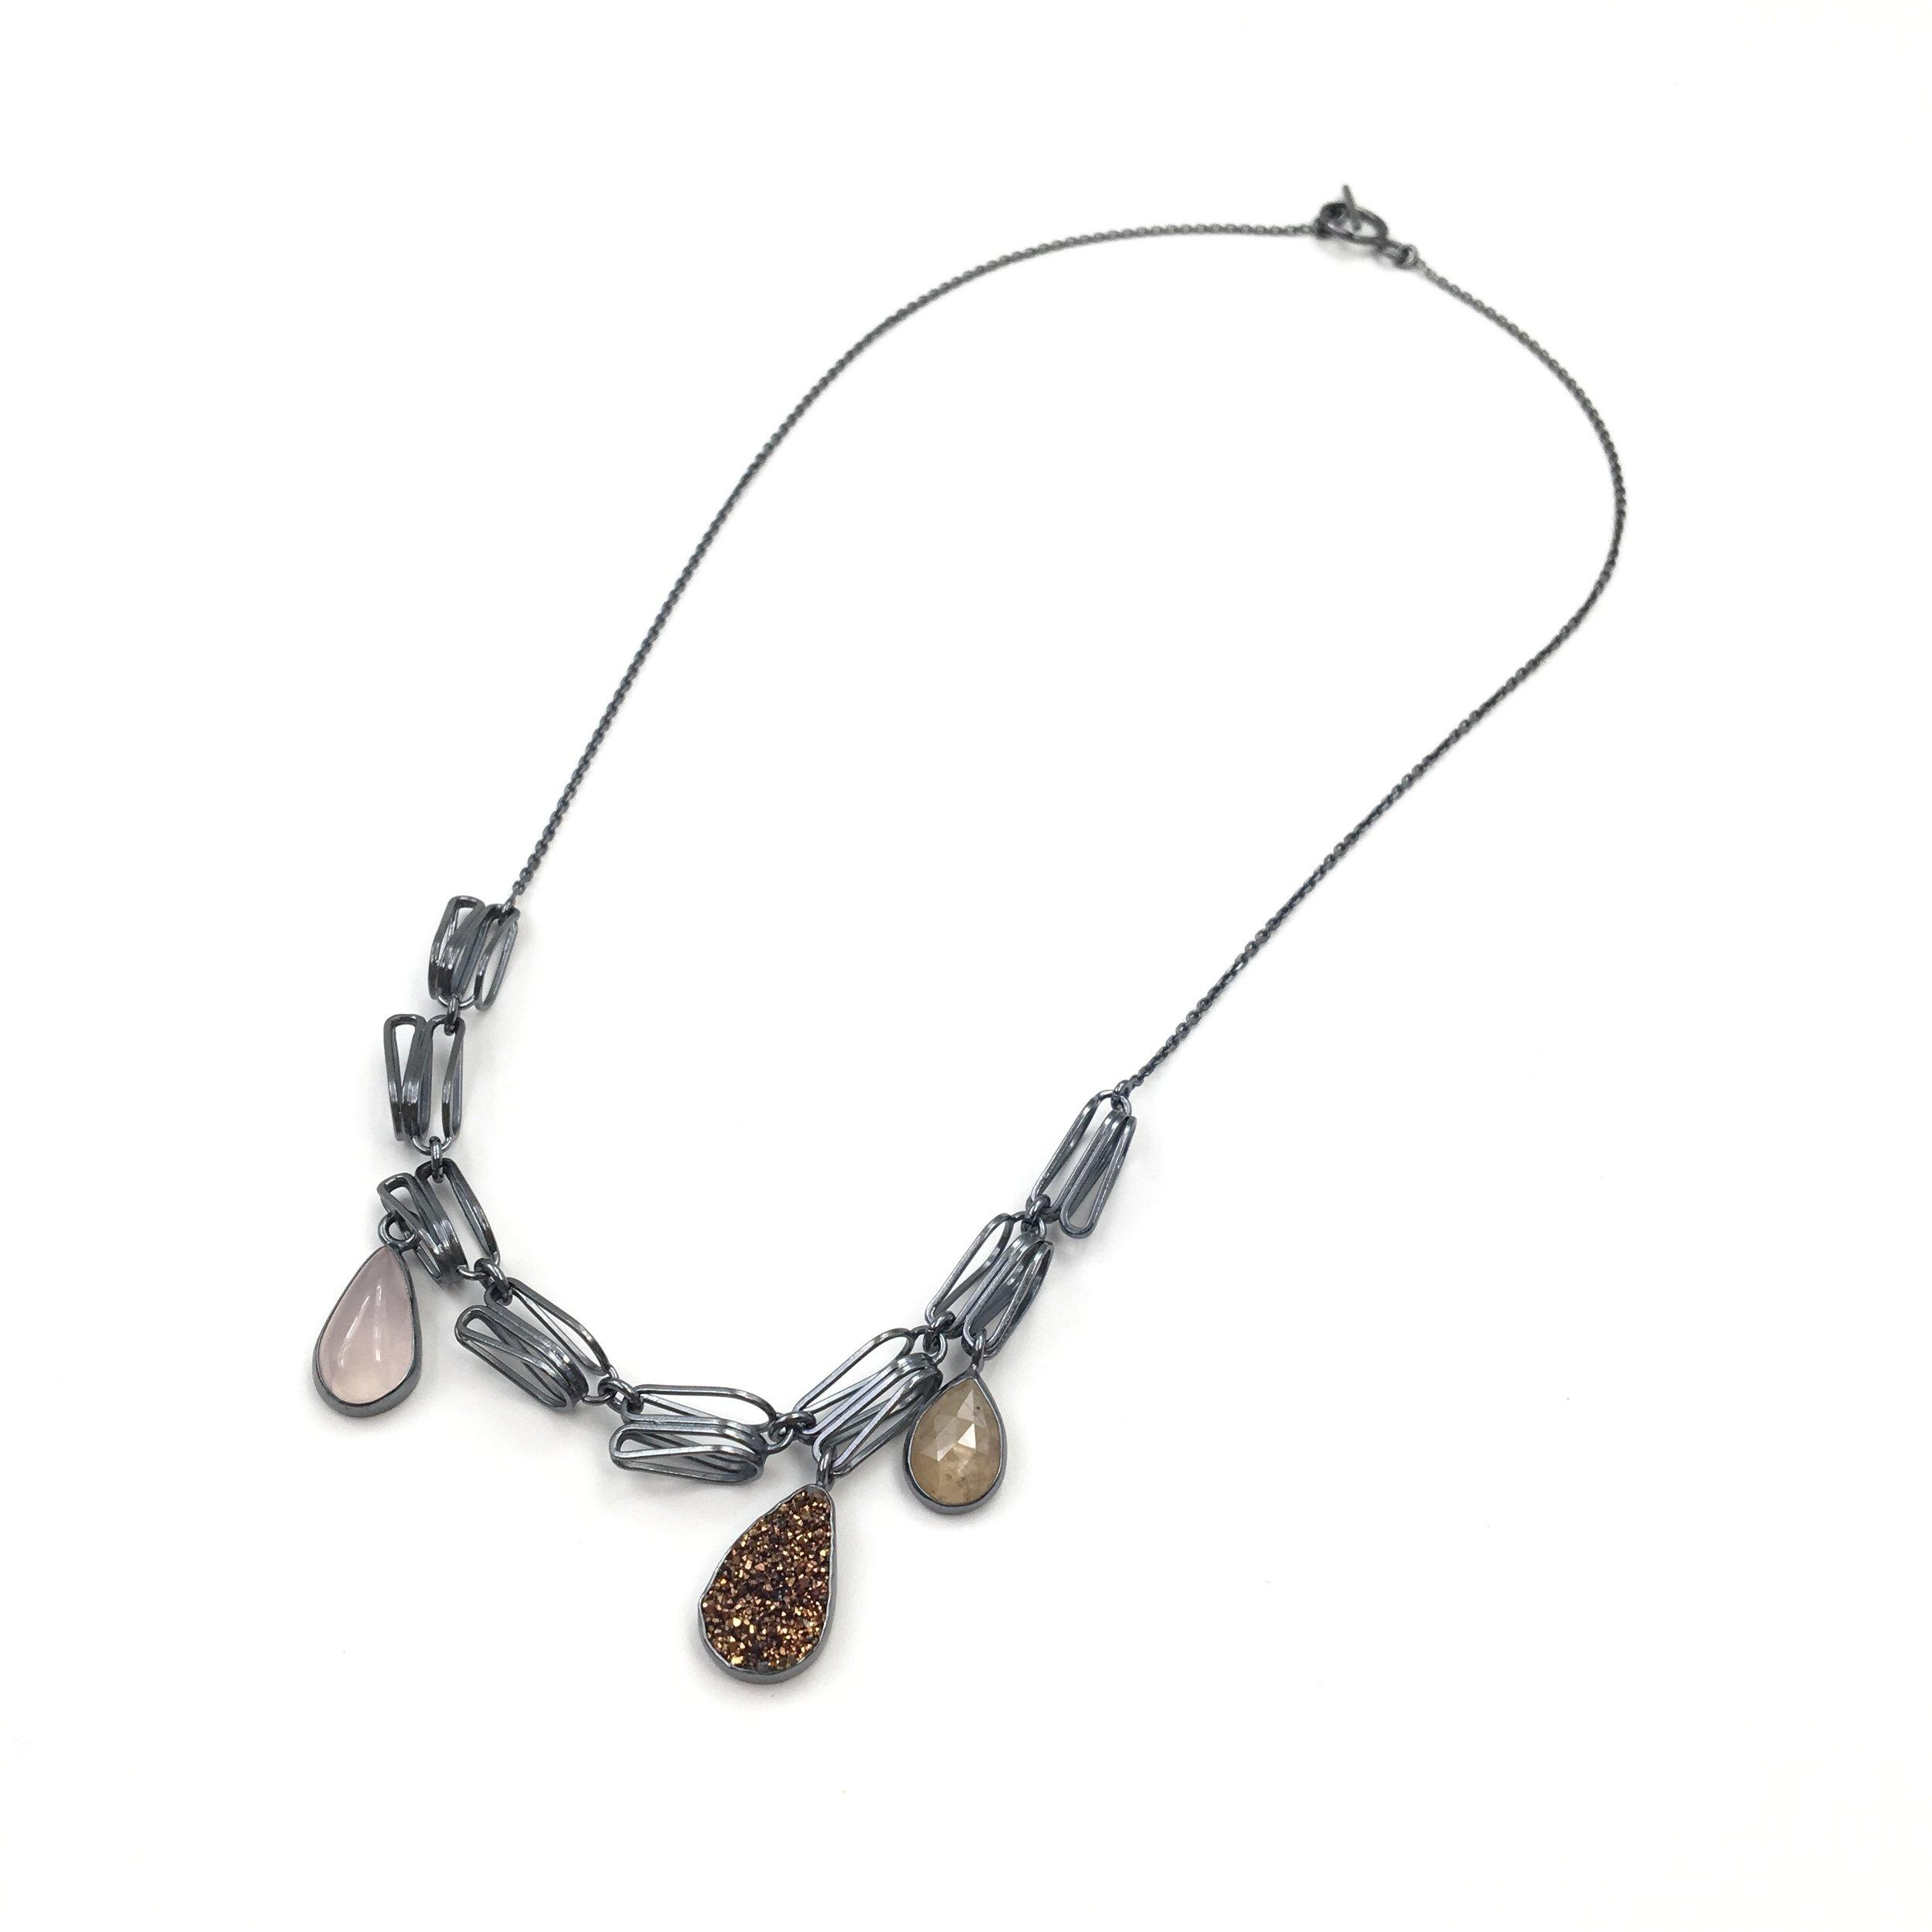 TEARDROP NECKLACE  Oxidized sterling silver, rose quartz, copper druzy, rose-cut sapphire